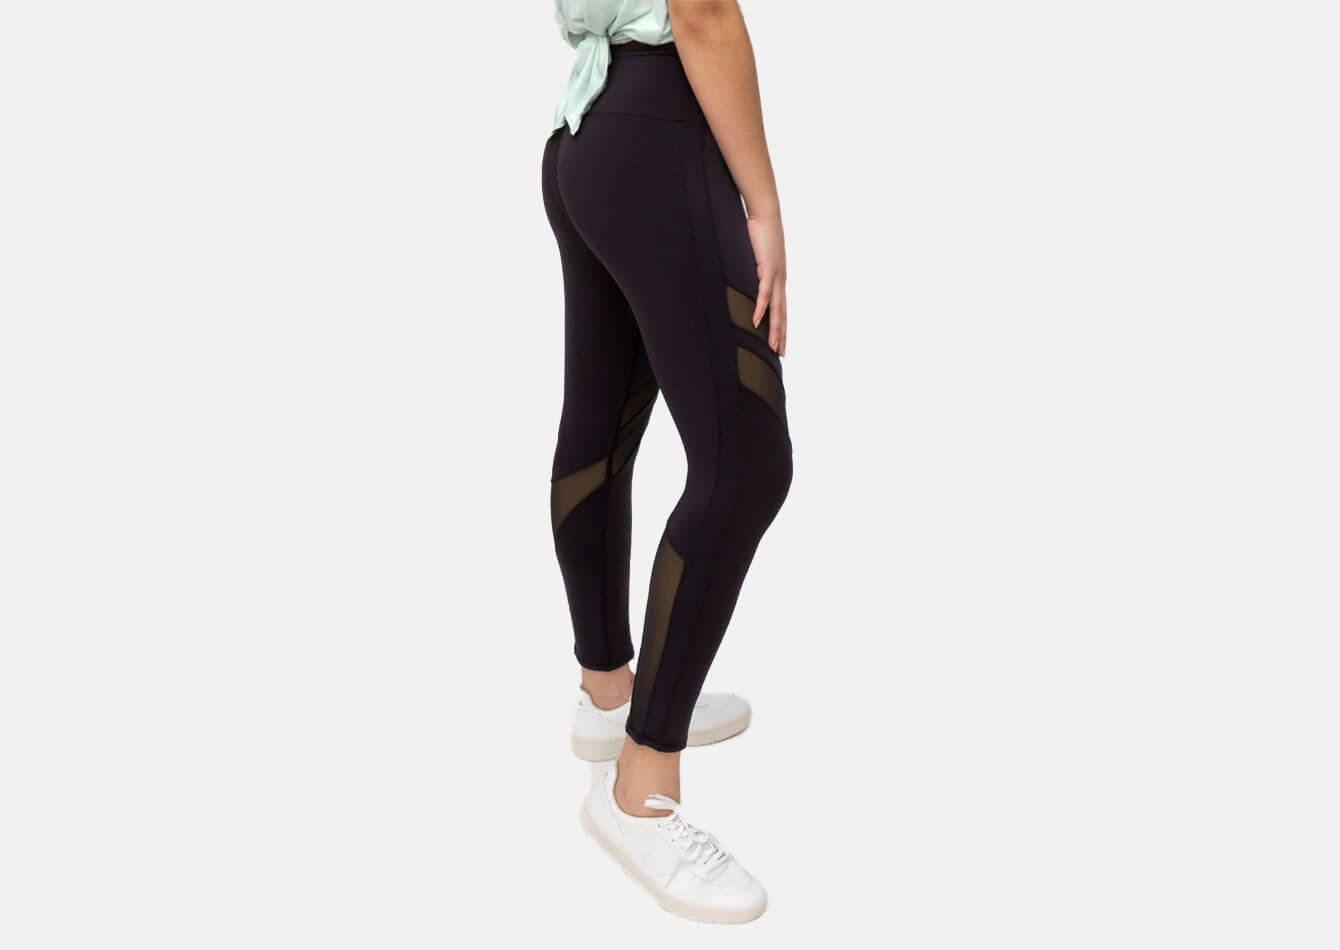 Athena Legging - tasc Performance (Black)